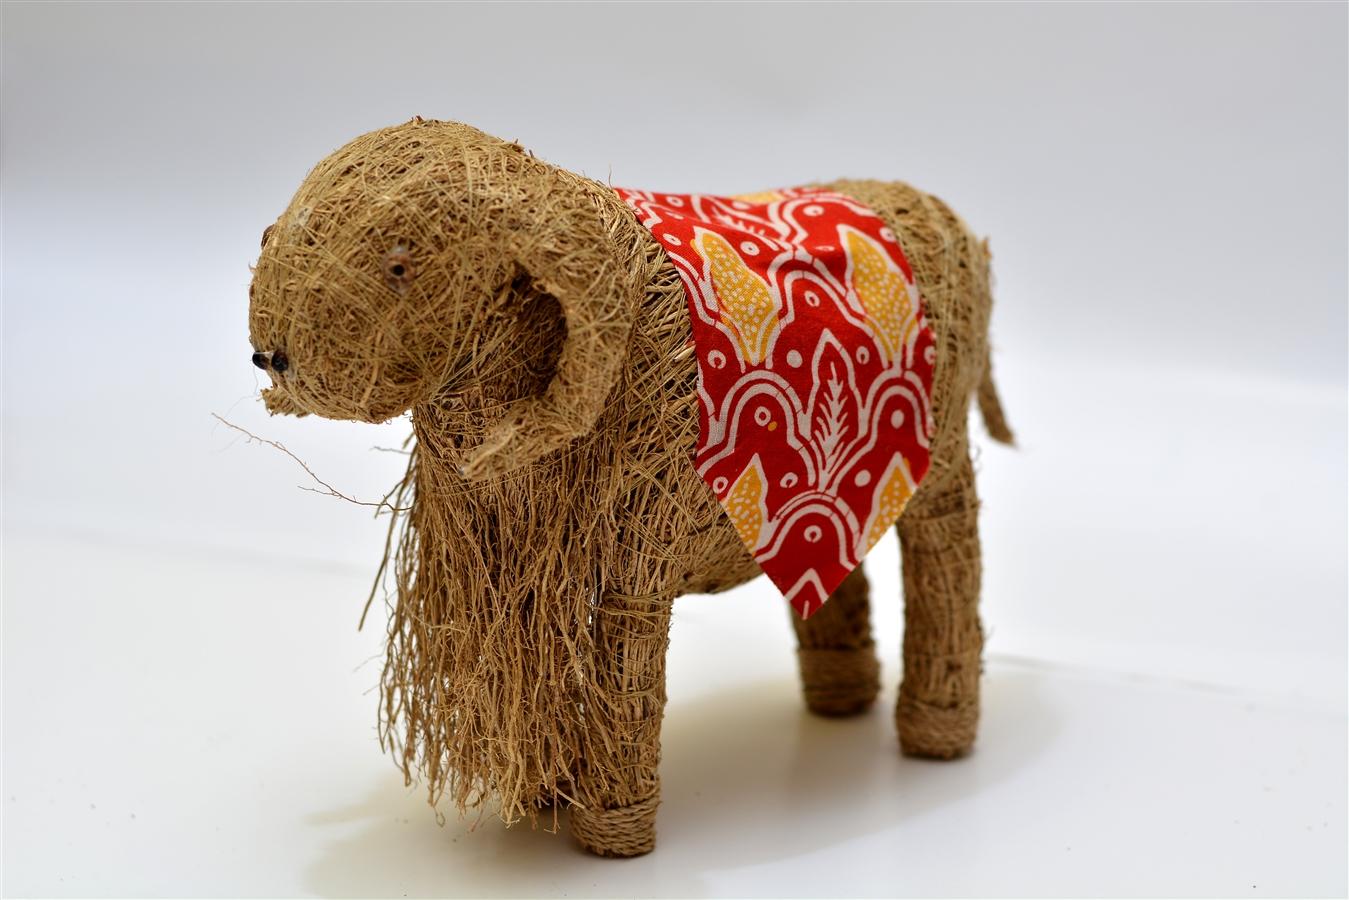 Salah satu produk kerajinan akar wangi berbentuk Domba Garut. (Paket Wisata Garut, Wisata Edukasi Kerajinan Akar Wangi, Study Tour)